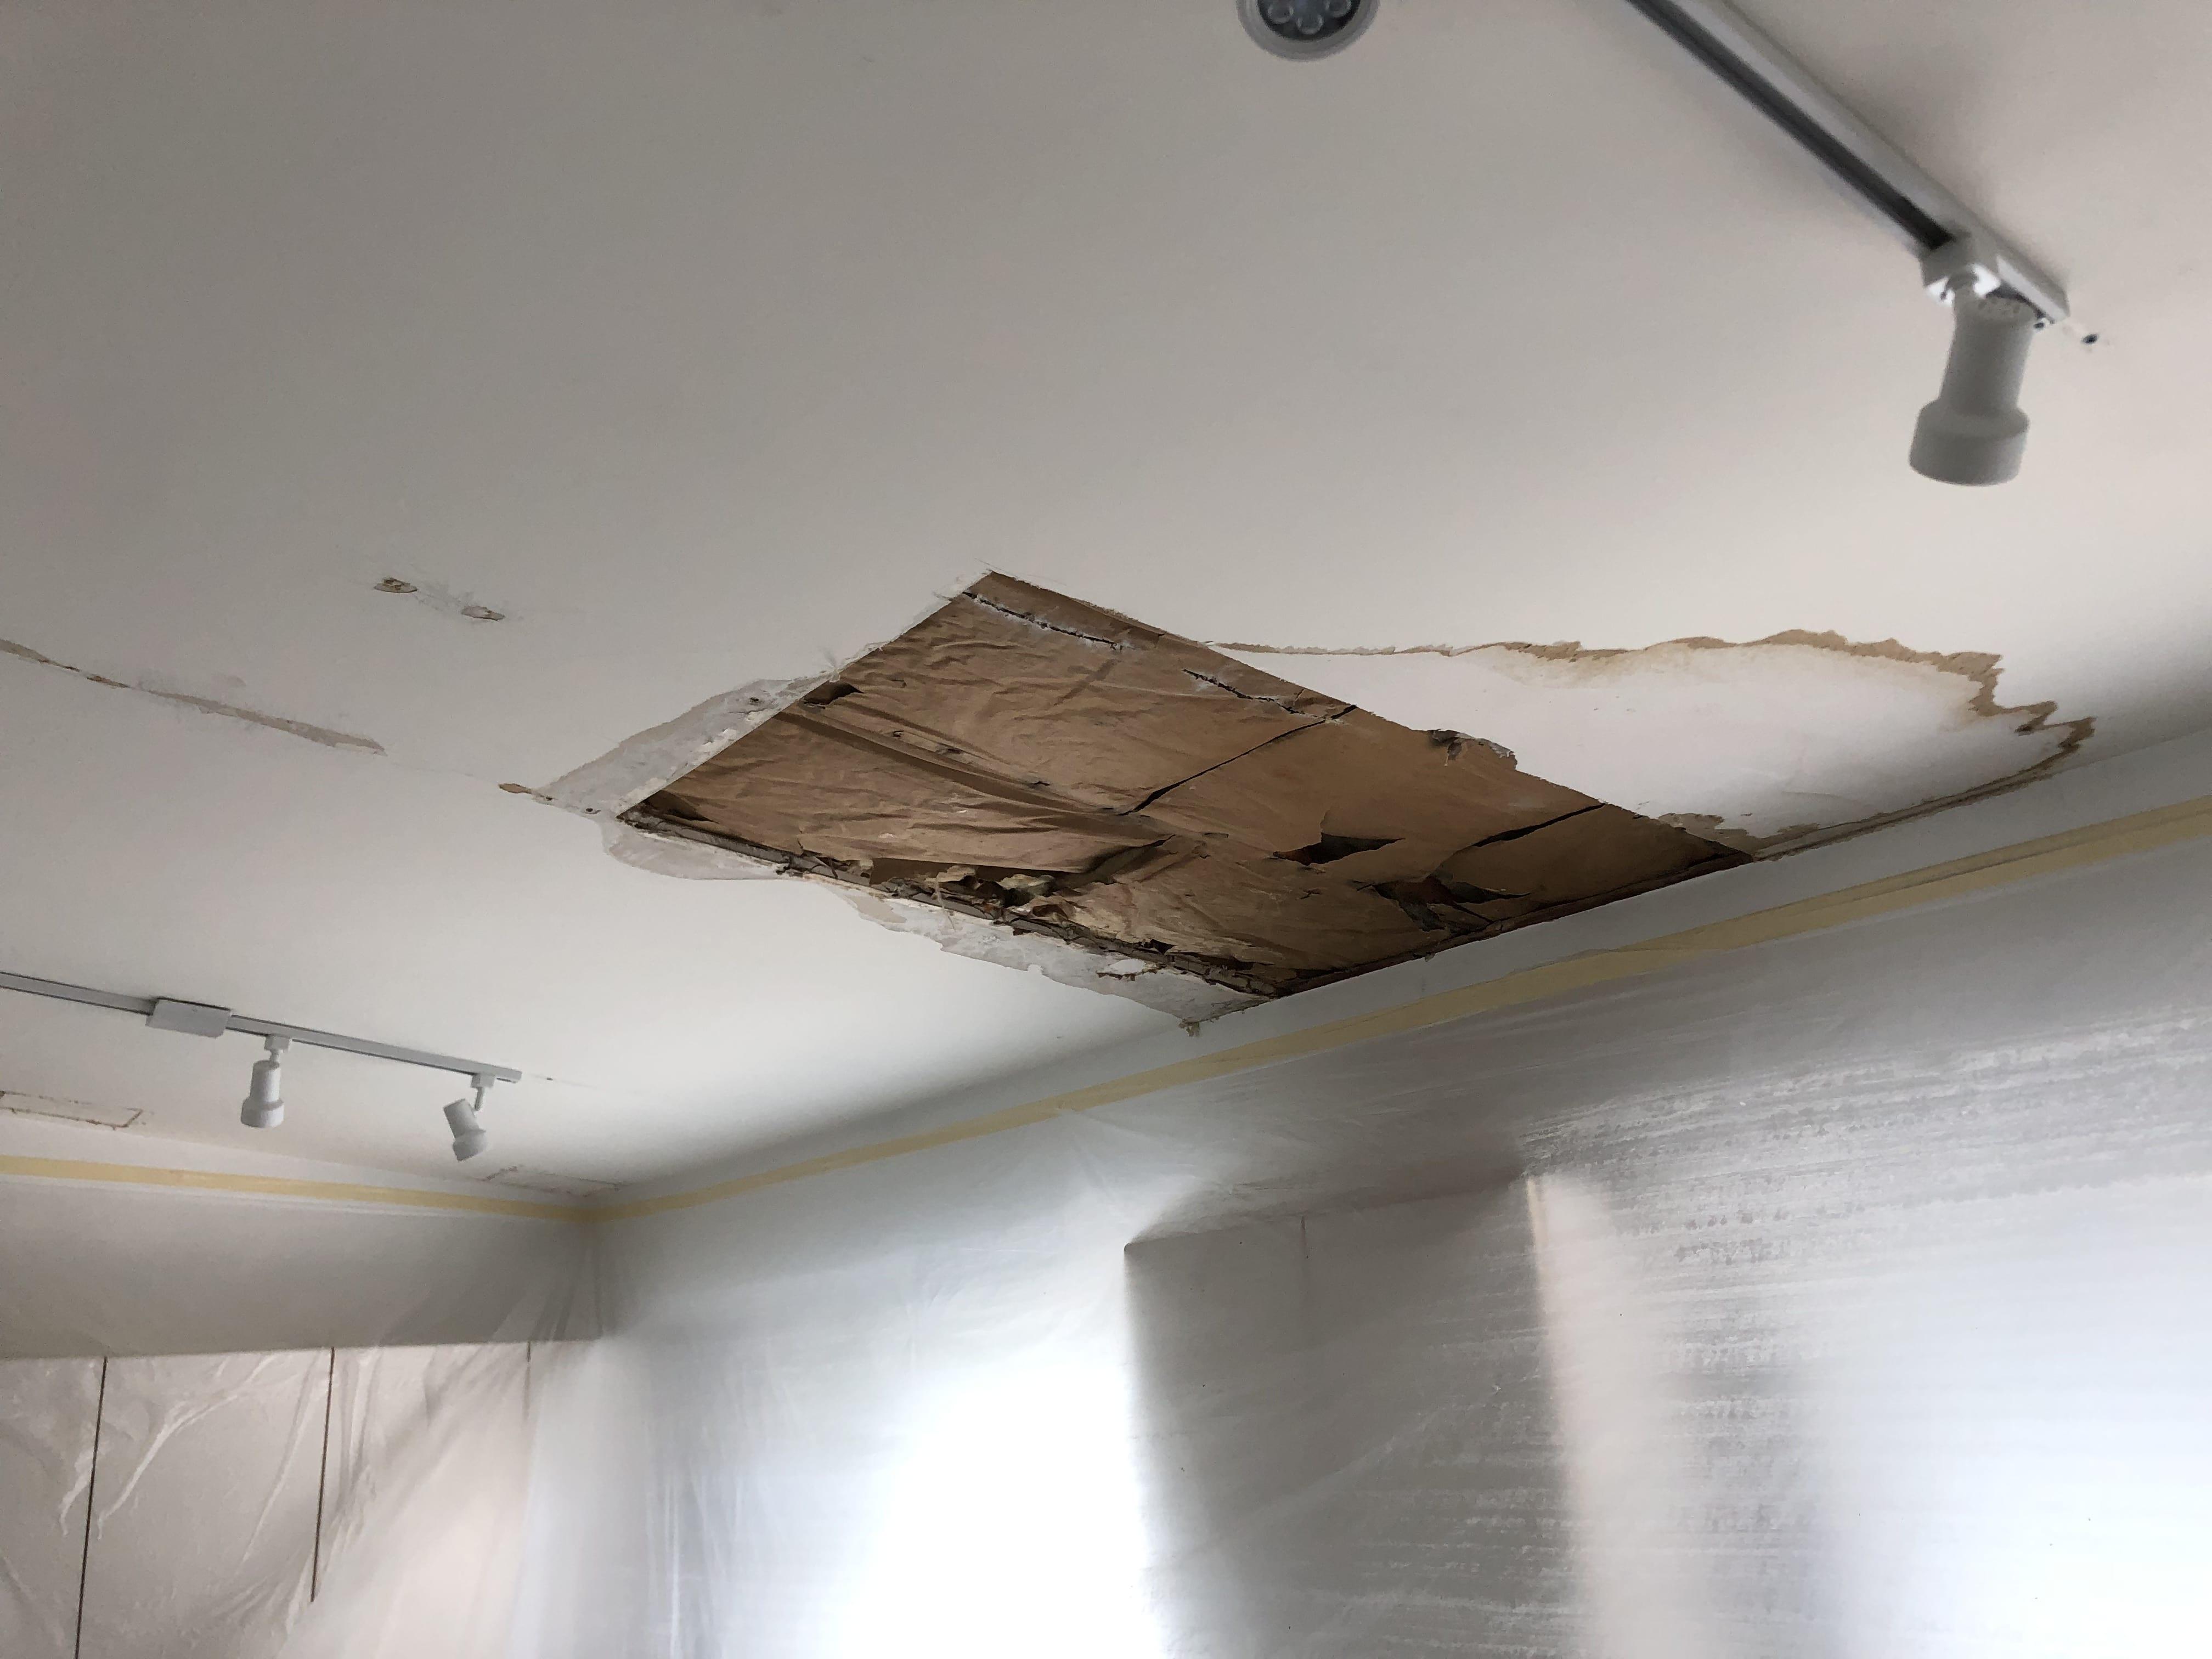 drywall contractors vancouver richmond bc